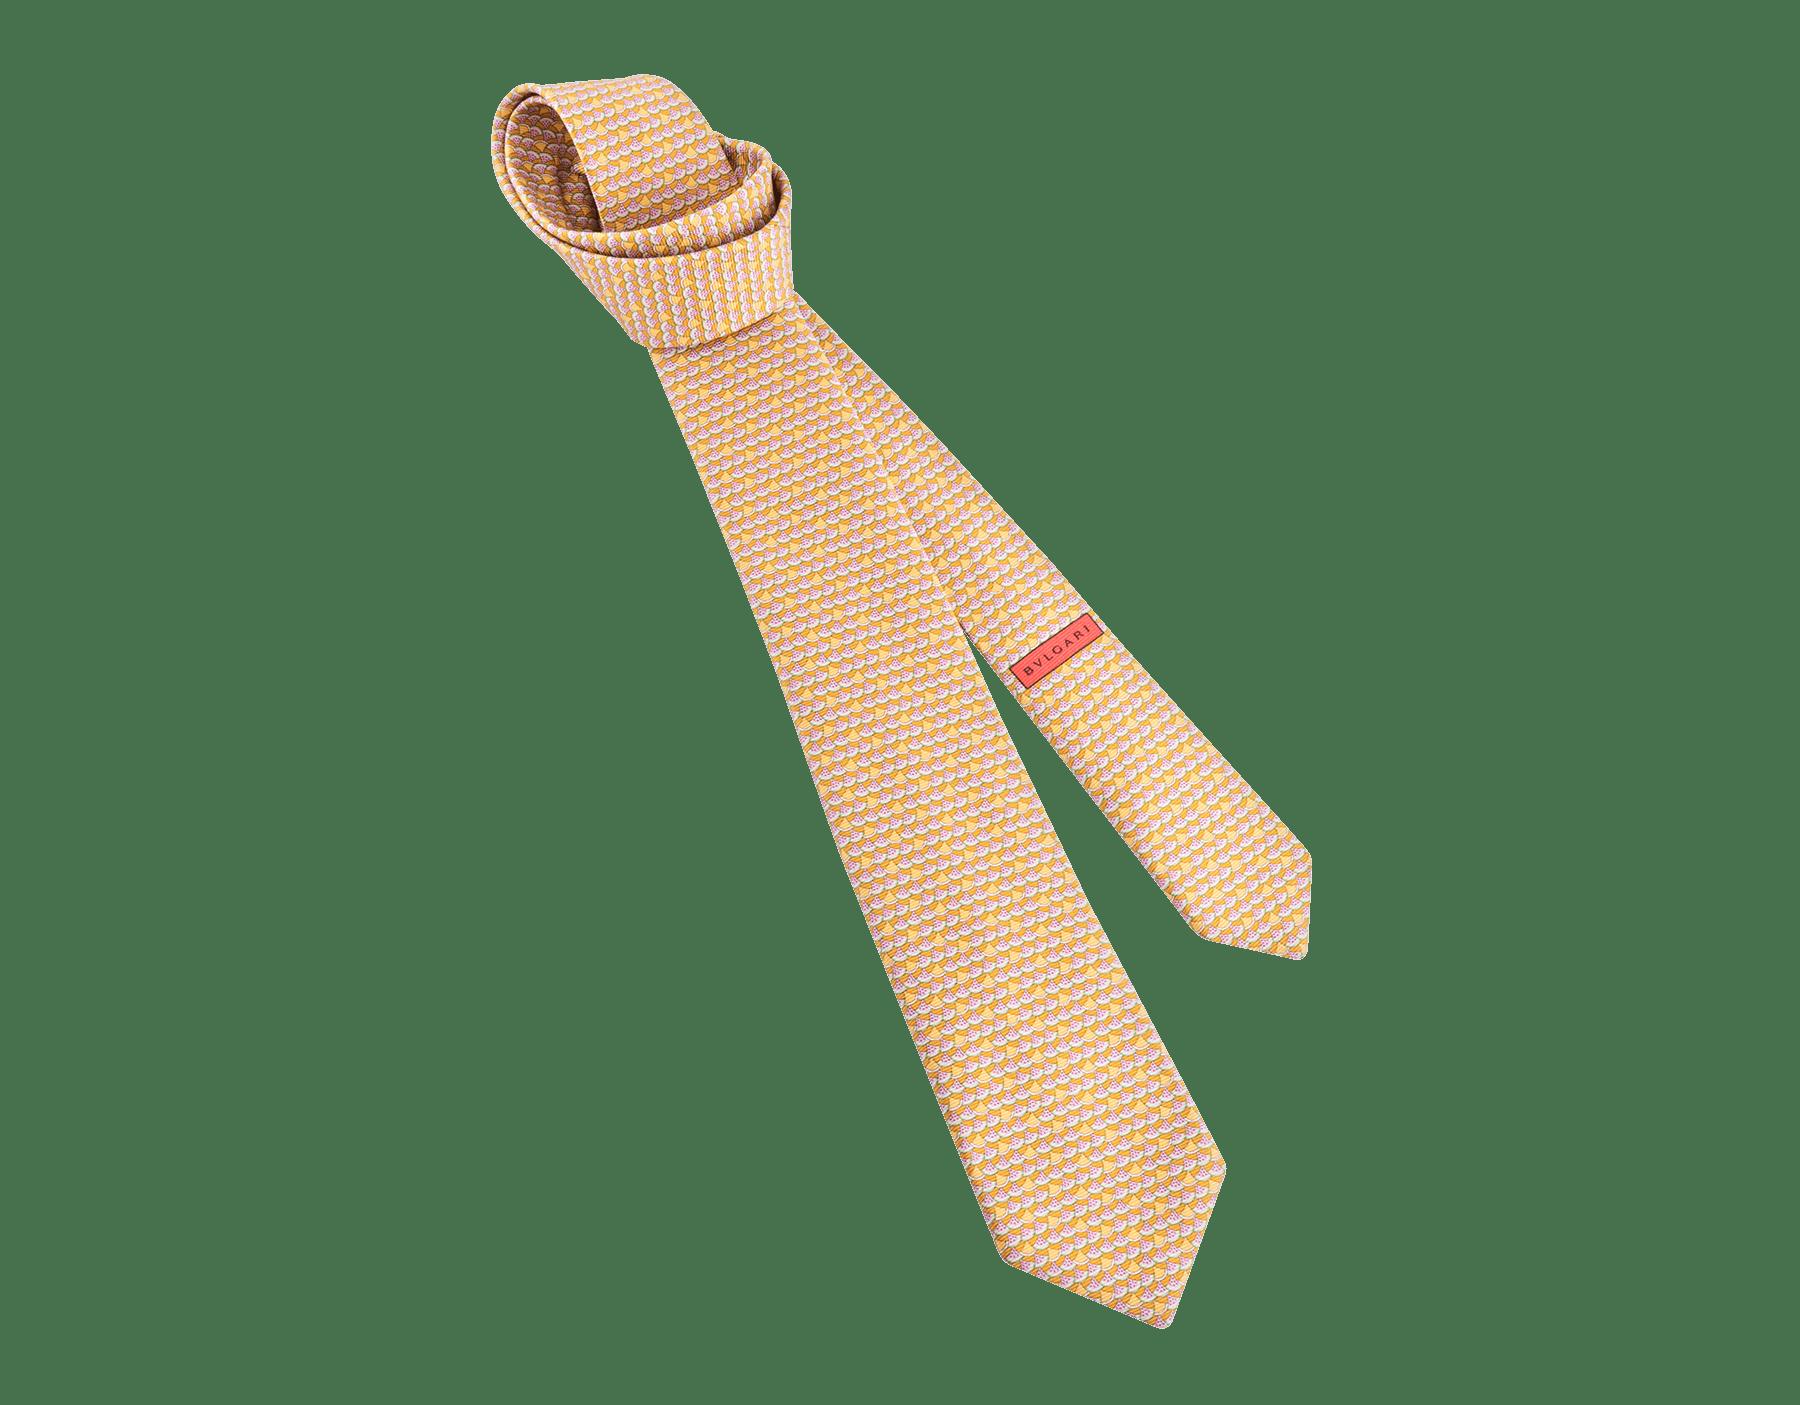 Mandarine orange Watermellon Diva pattern seven-folds tie in fine saglione printed silk. 243324 image 1